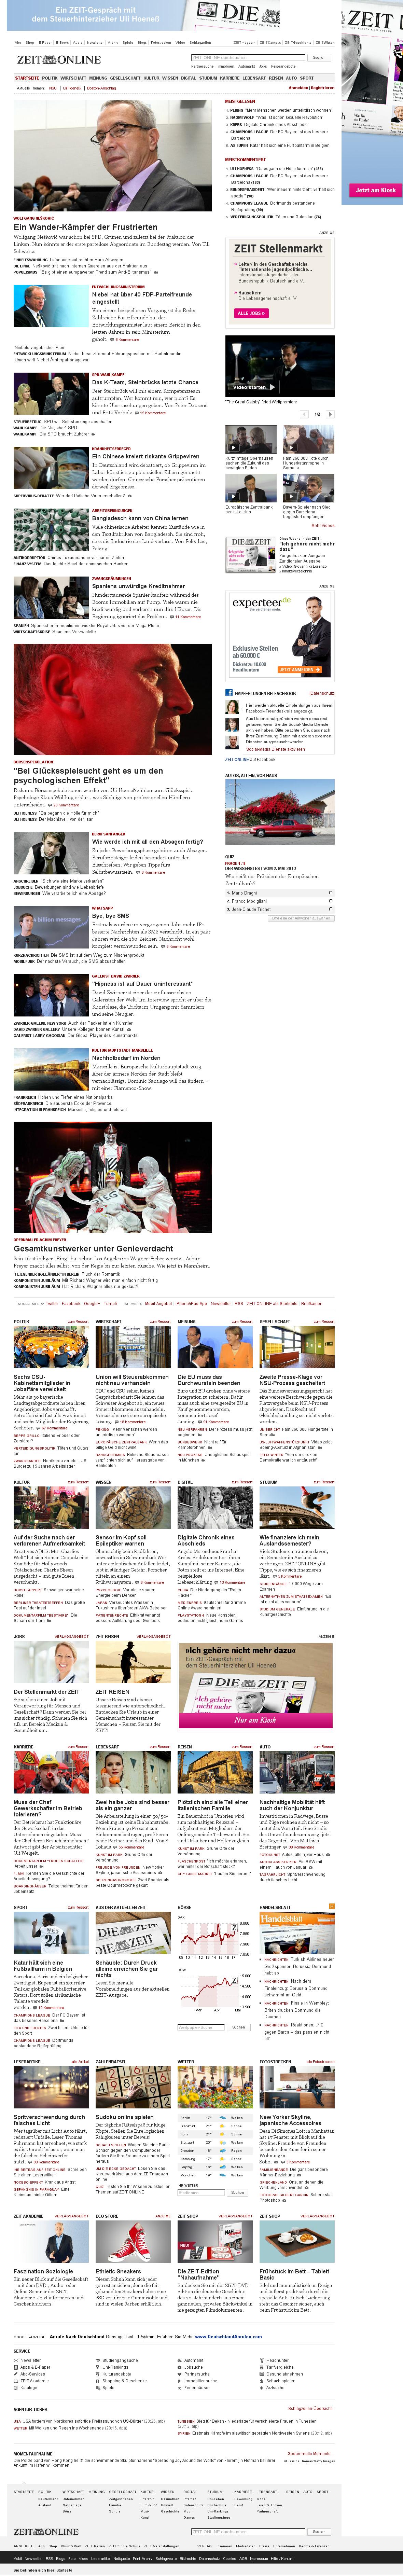 Zeit Online at Thursday May 2, 2013, 6:33 p.m. UTC